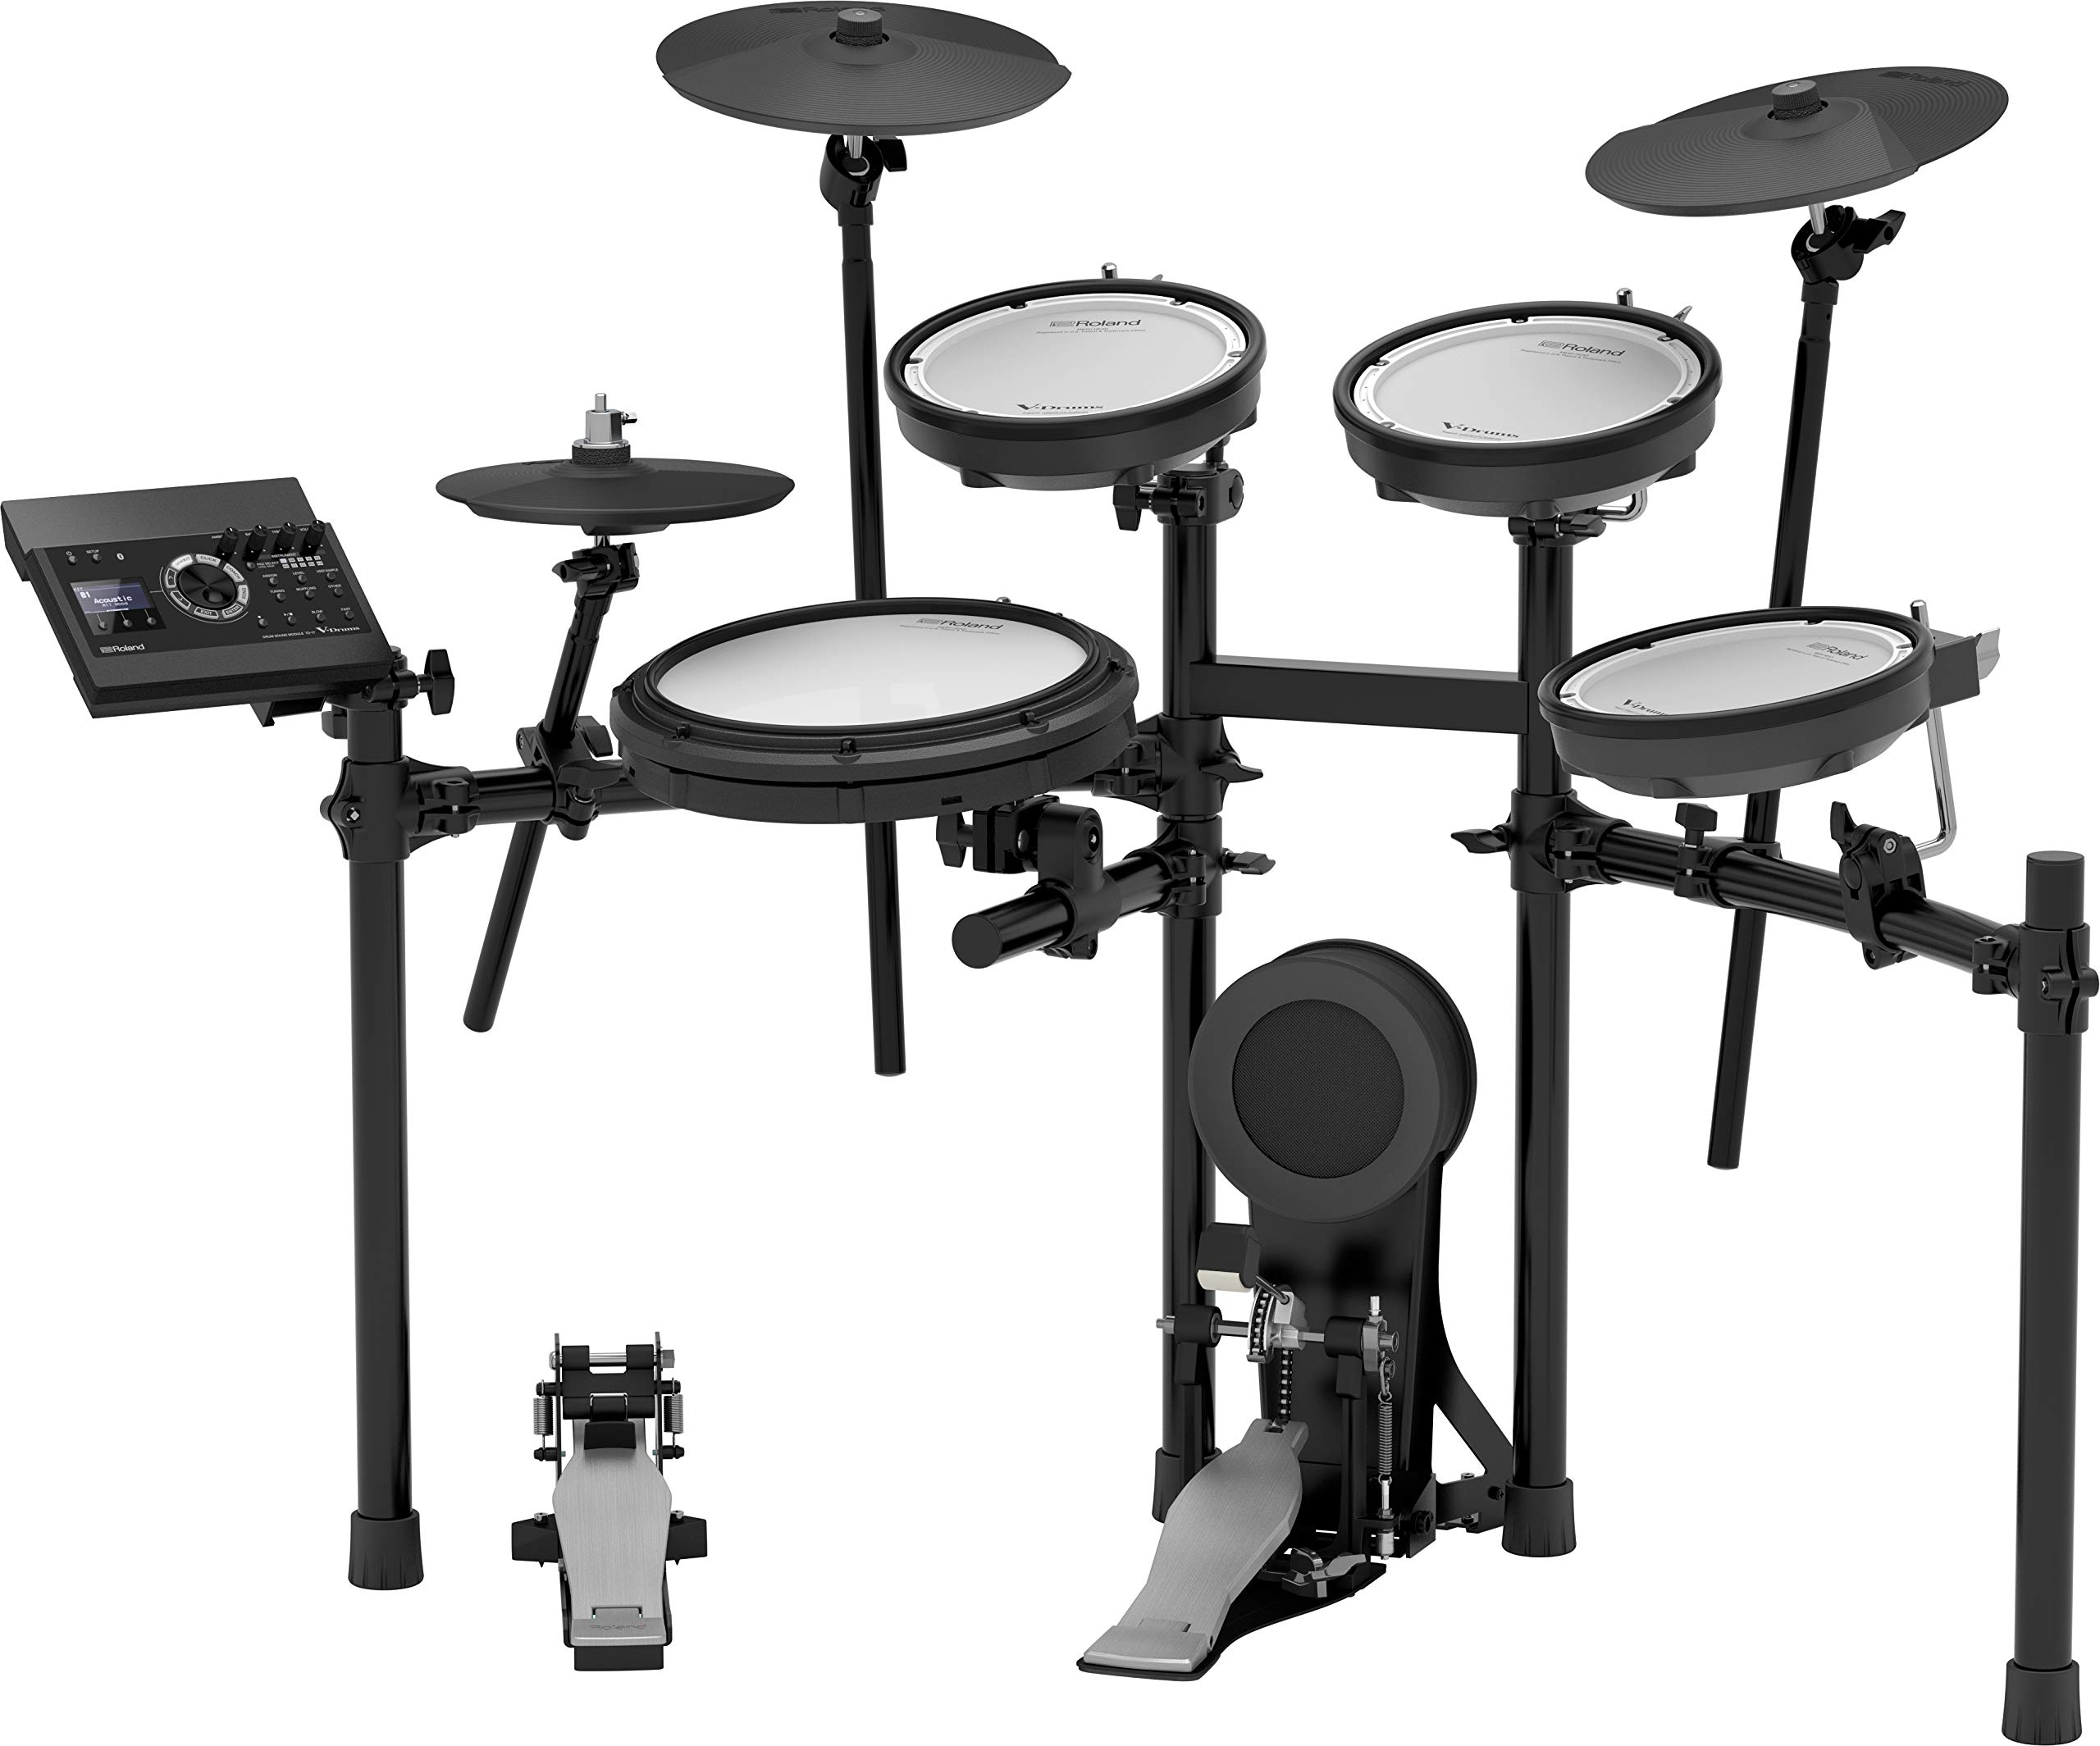 Roland V-Compact Series Electronic Drum Kit (TD-17KV-S)